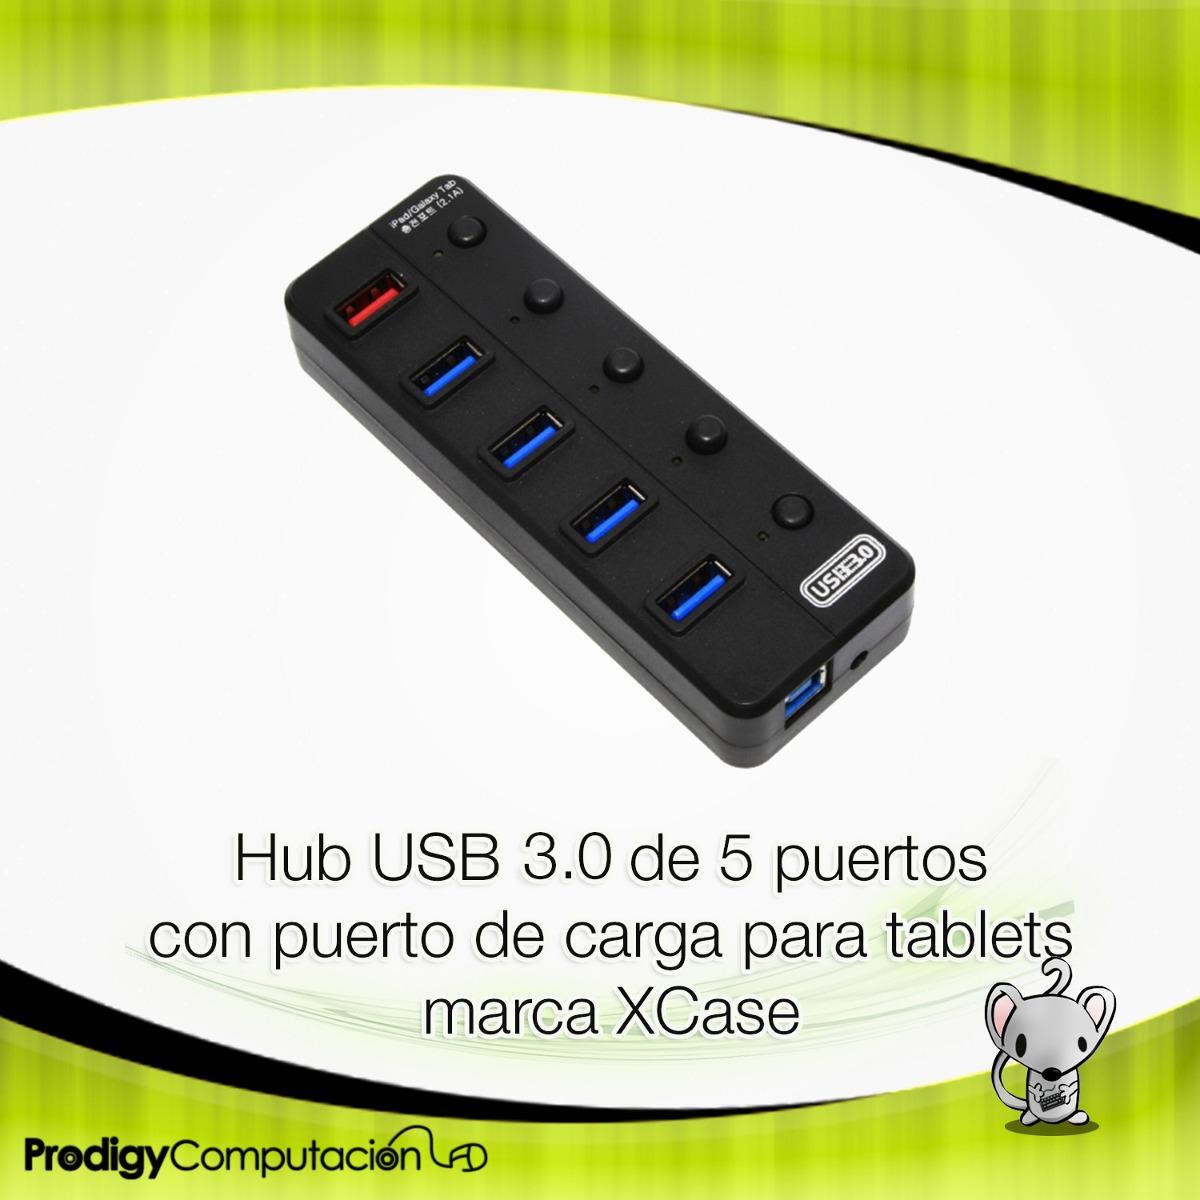 hub hub 5 puerto: